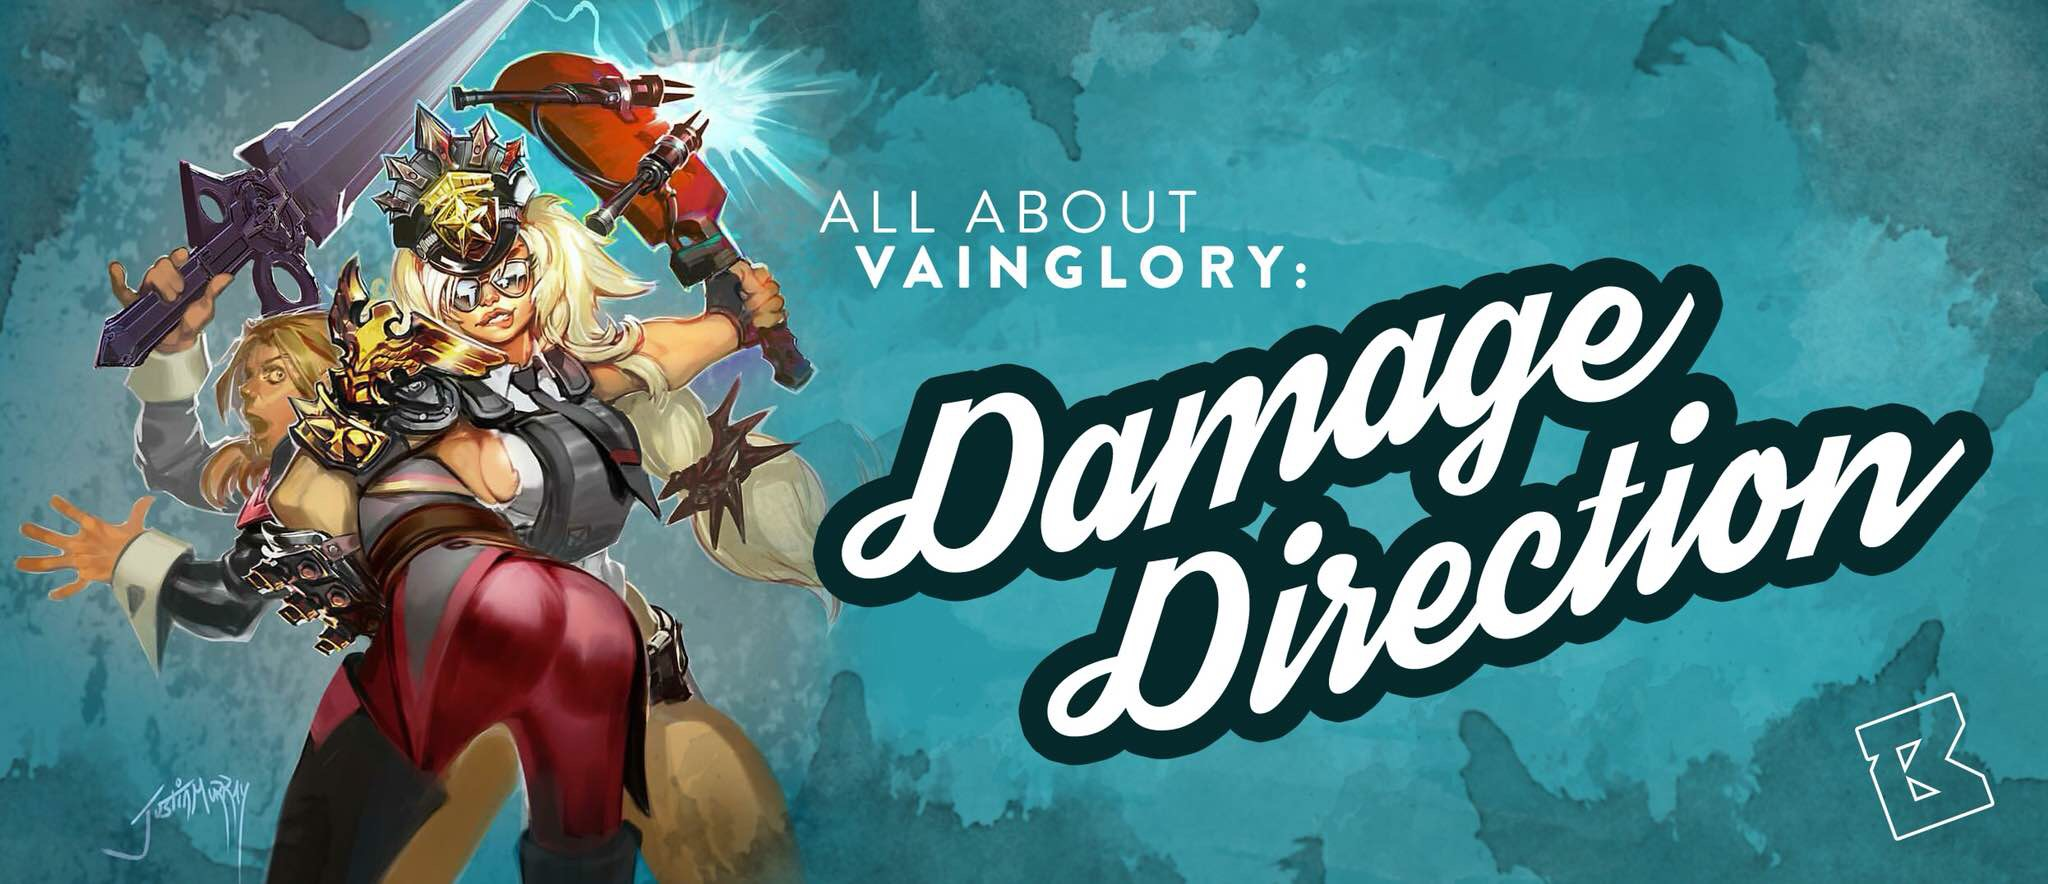 vainglory damage